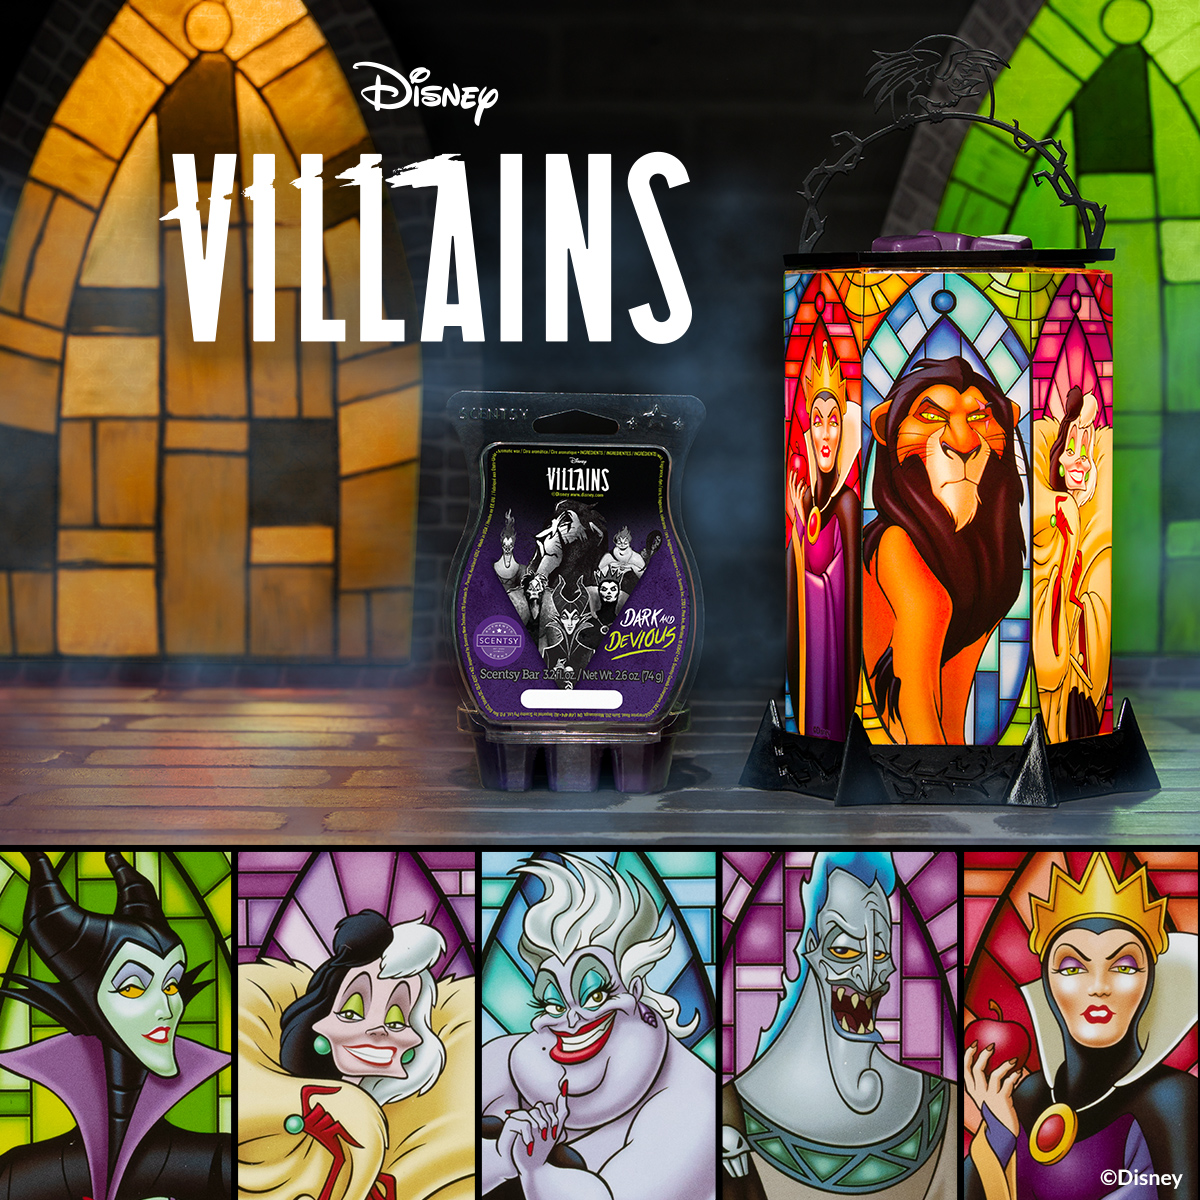 Disney Villains: All the Rage & Disney Villains: Dark and Devious